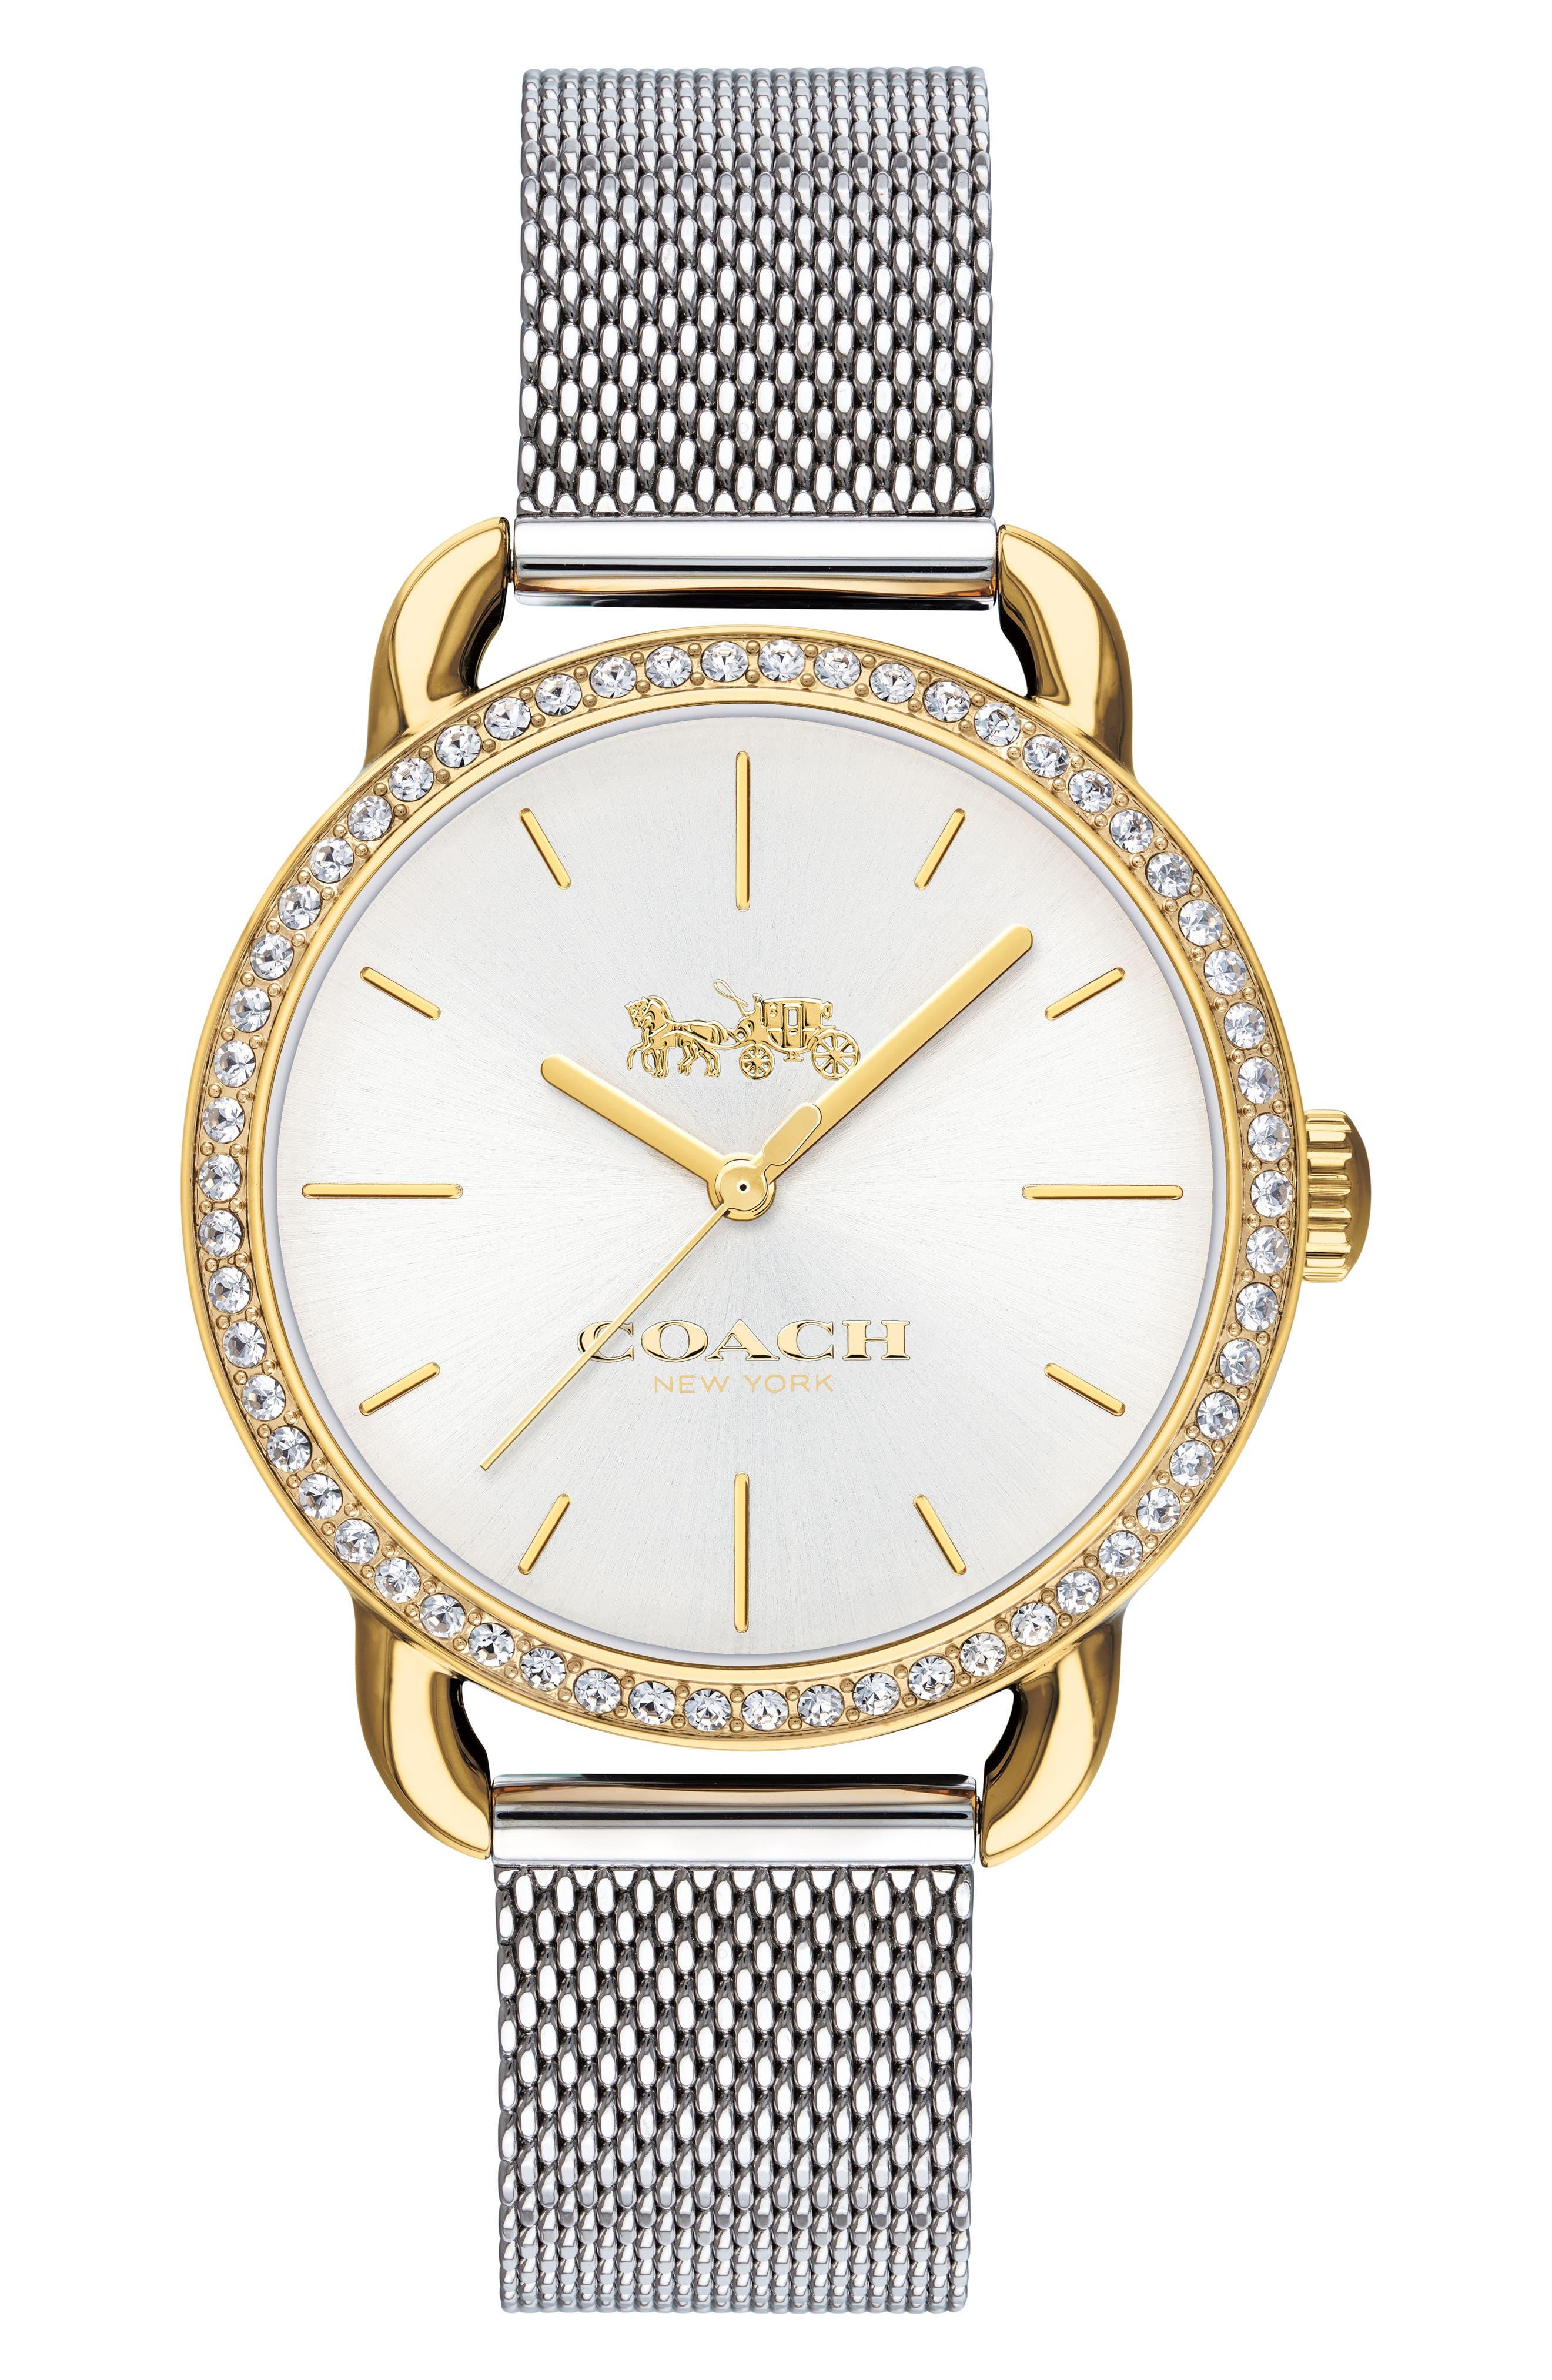 Alternate Image 1 Selected - COACH Lex Crystal Mesh Bracelet Watch, 32mm